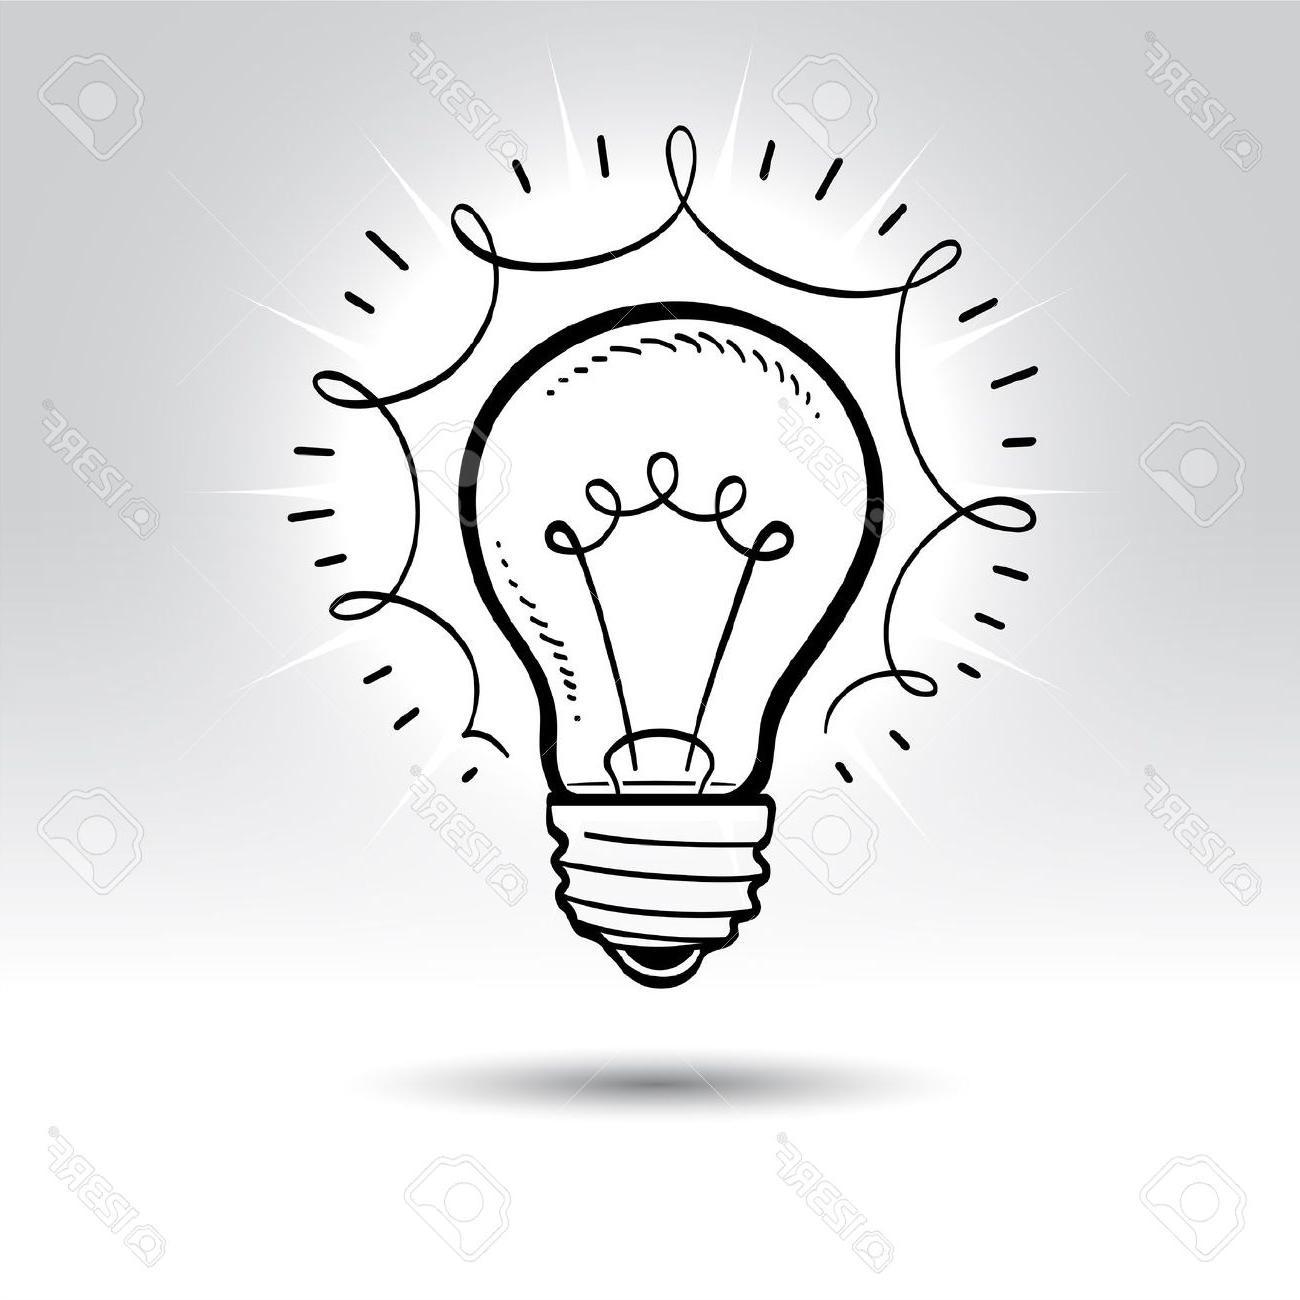 1300x1300 Best Hd Light Bulb Drawing Stock Vector Idea Design